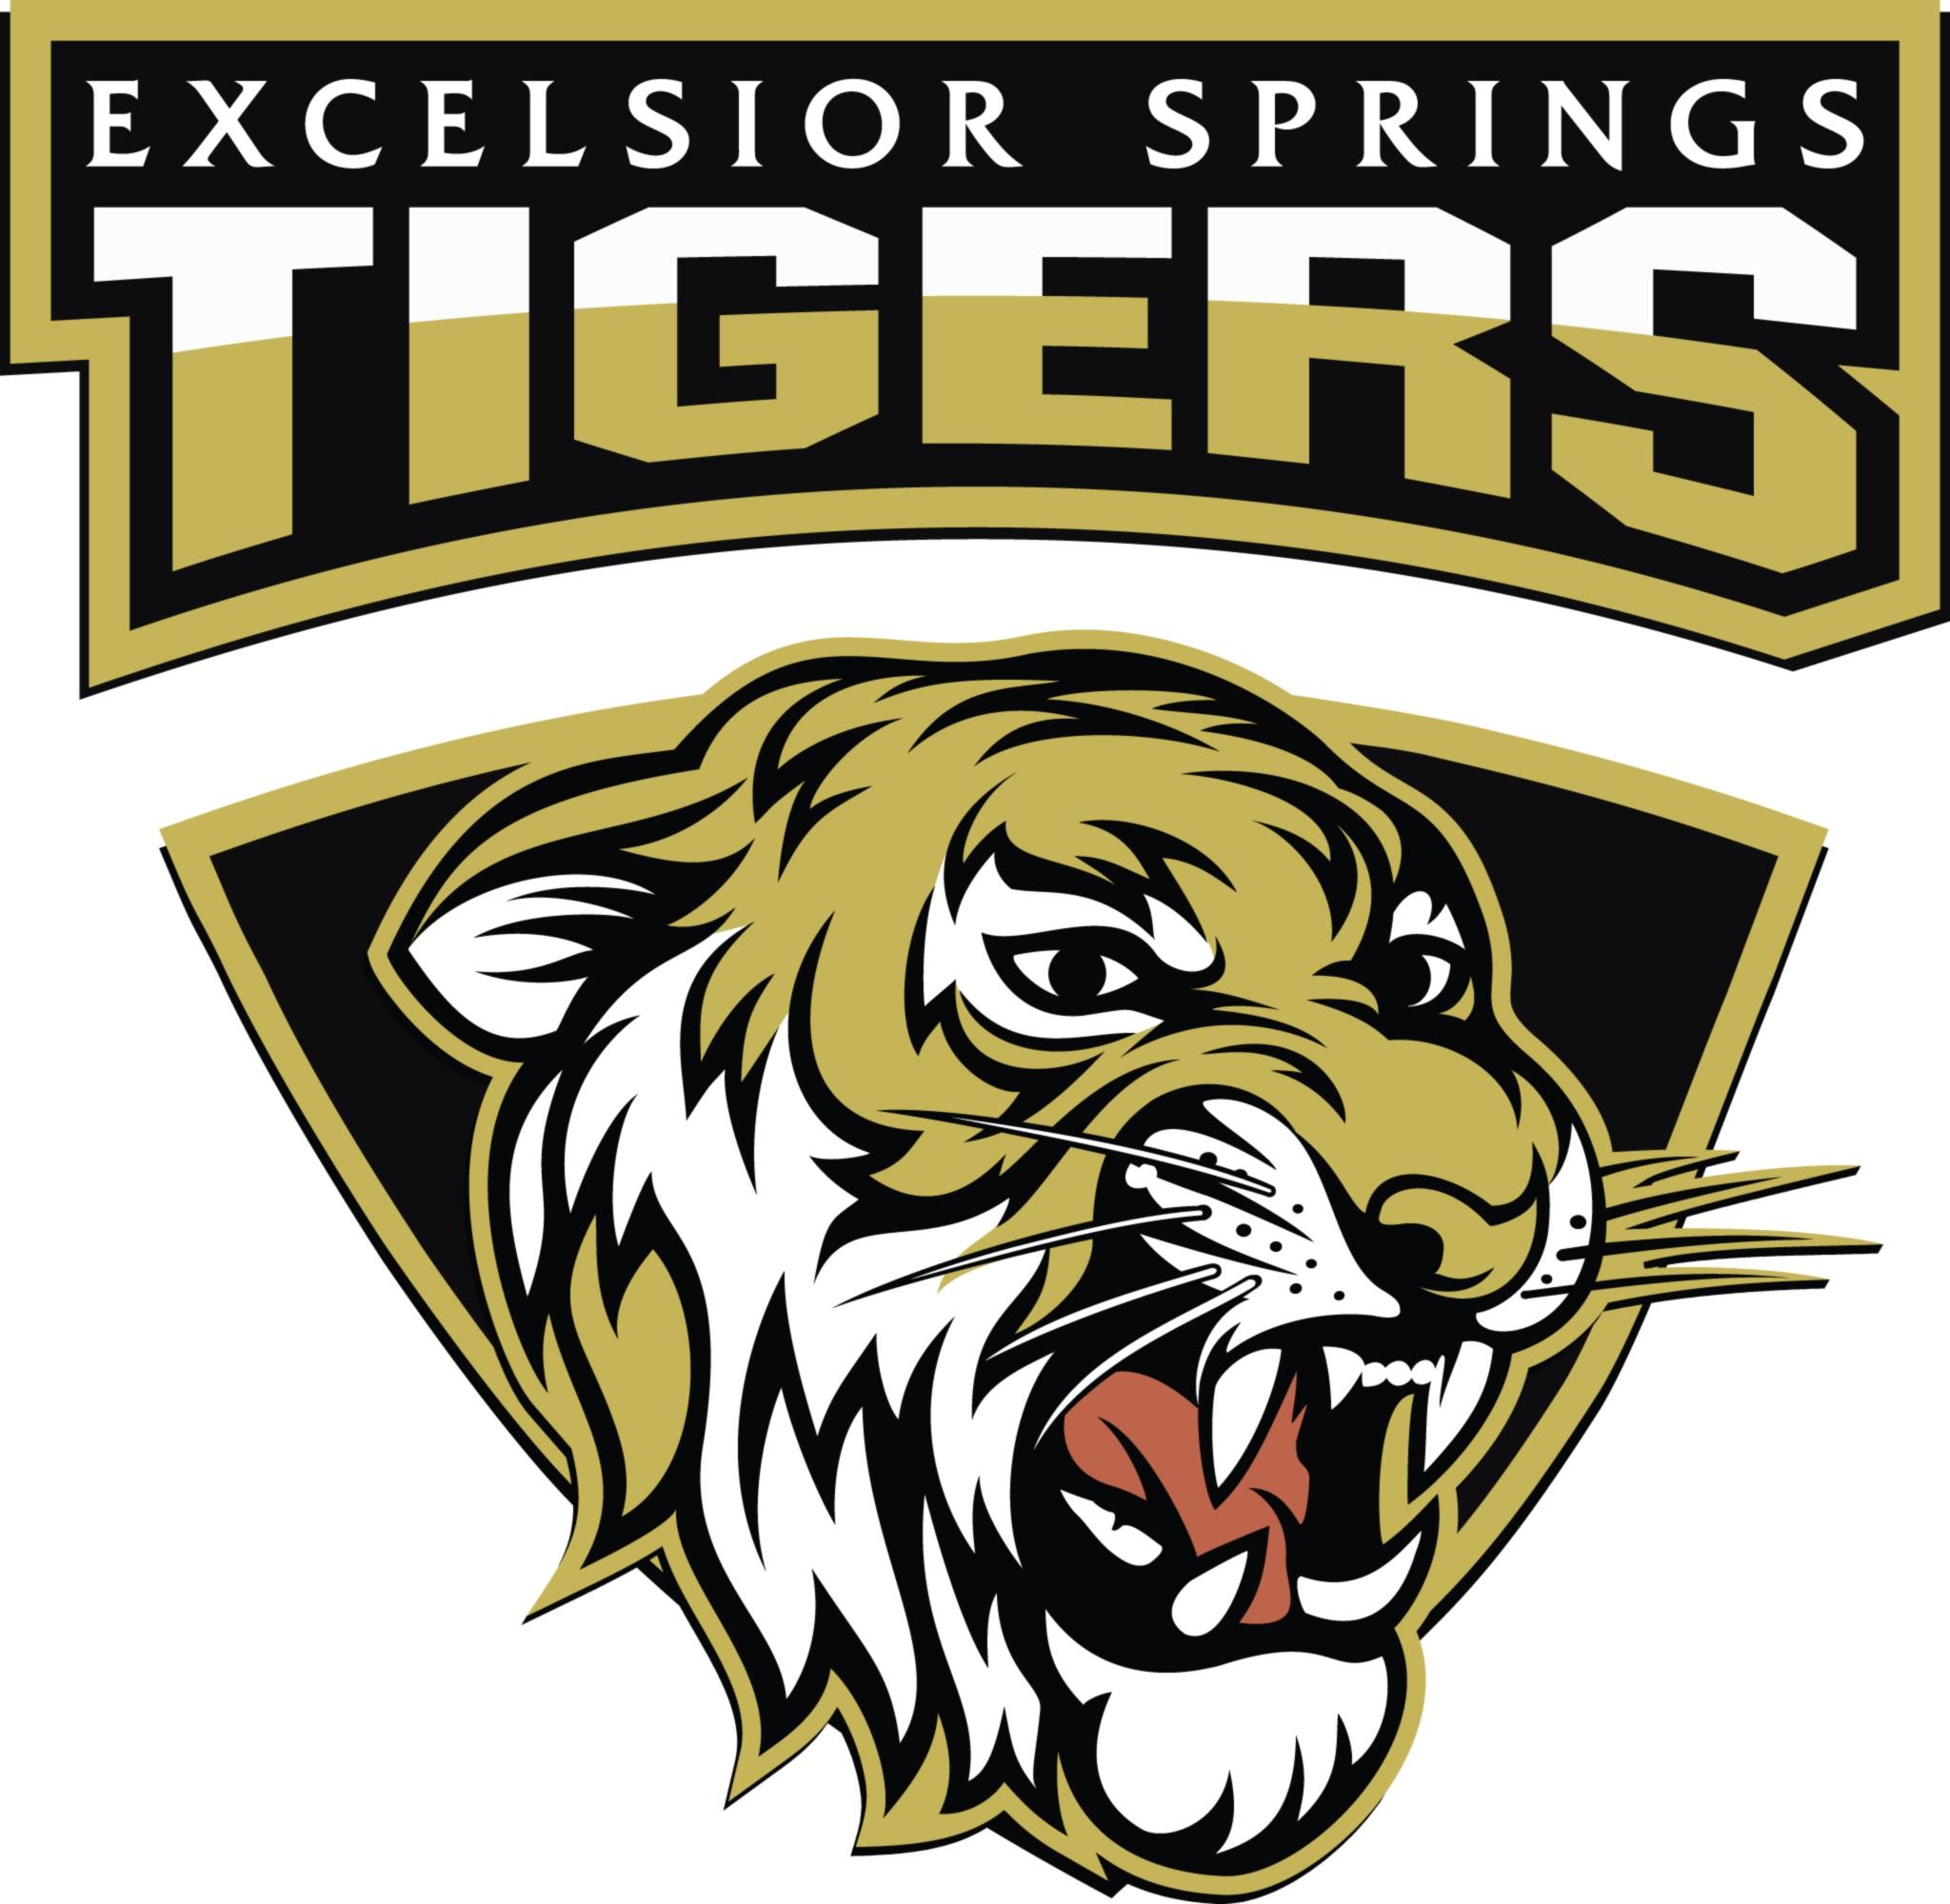 MSHSAA Excelsior Springs High School School Information